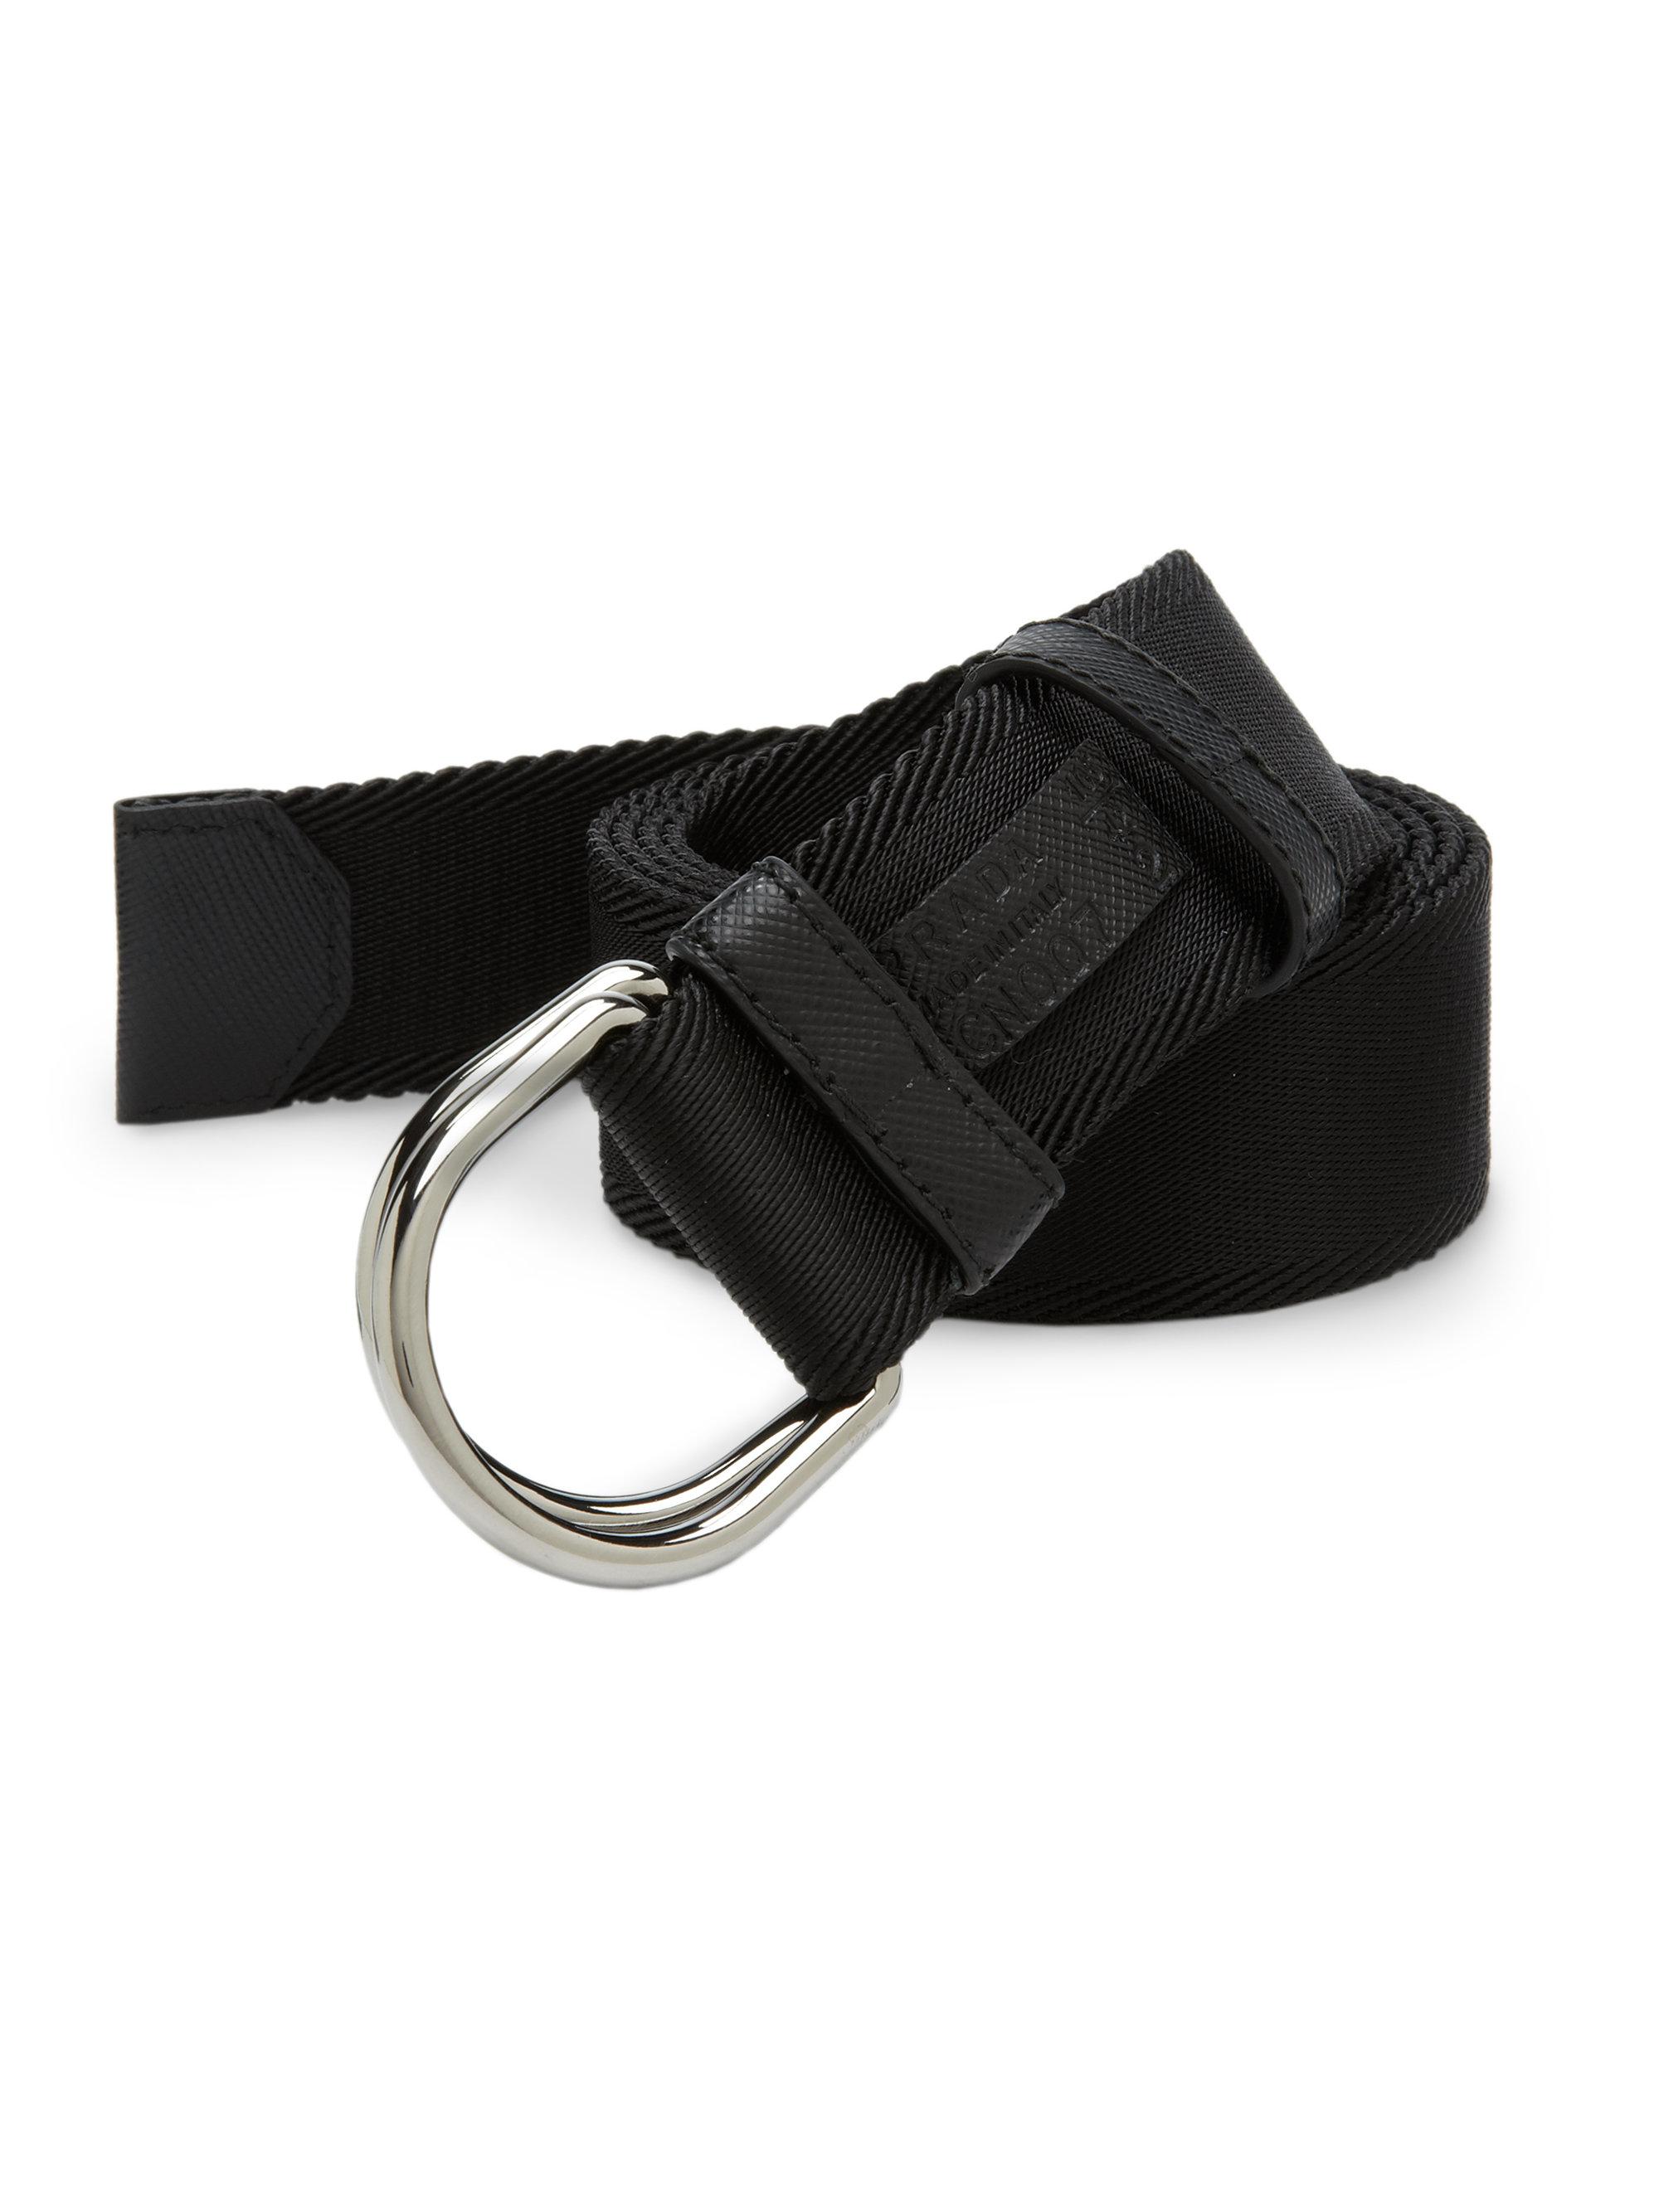 Men\u0026#39;s Prada Belts   Lyst?